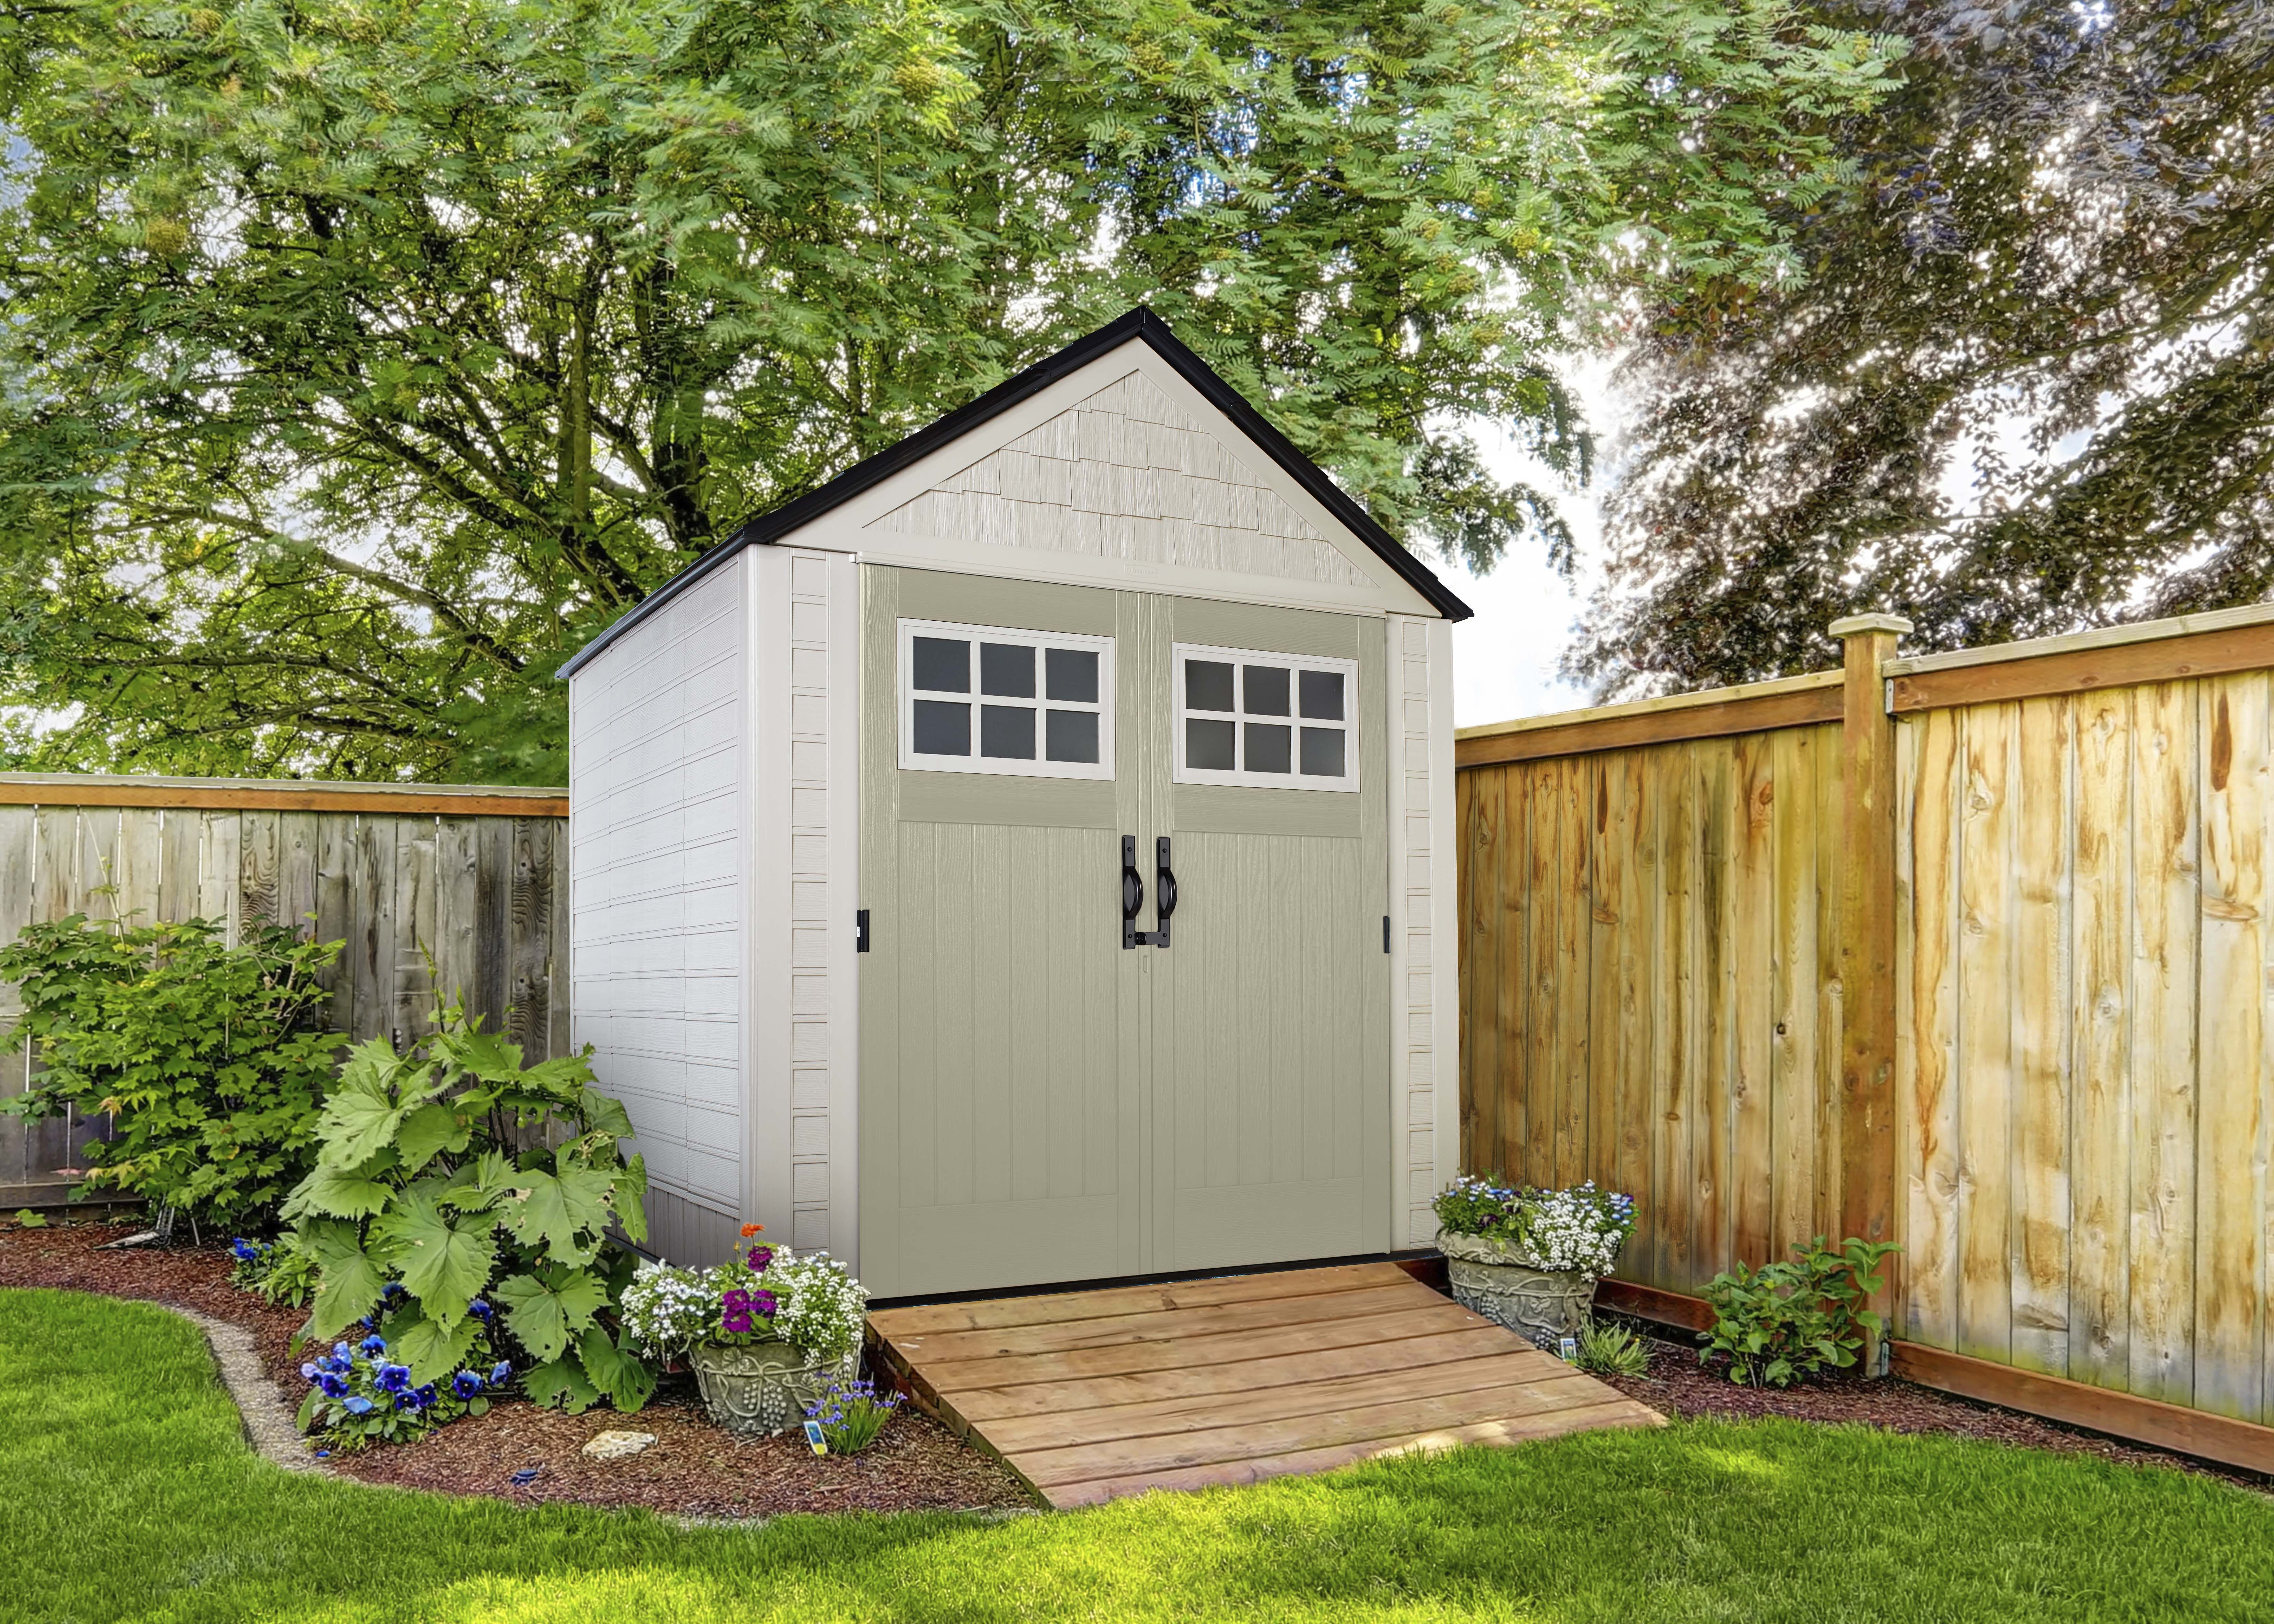 Pin On Backyard Backyard garden shed ideas